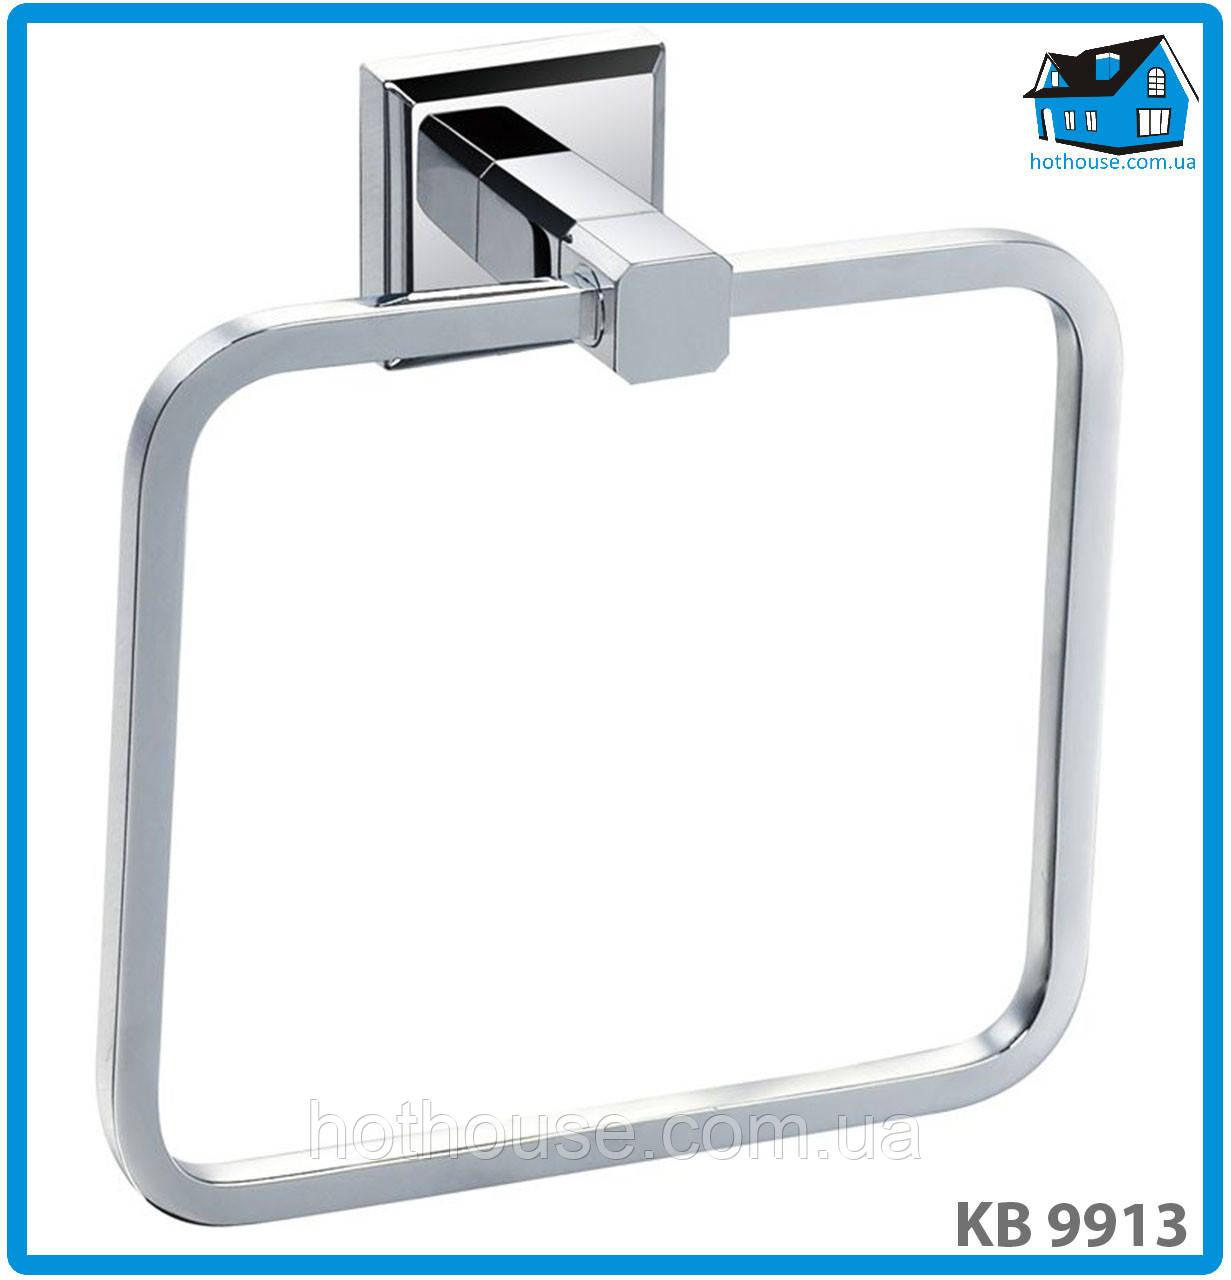 Держатель для полотенца Perfect Sanytary Appliances KB 9913